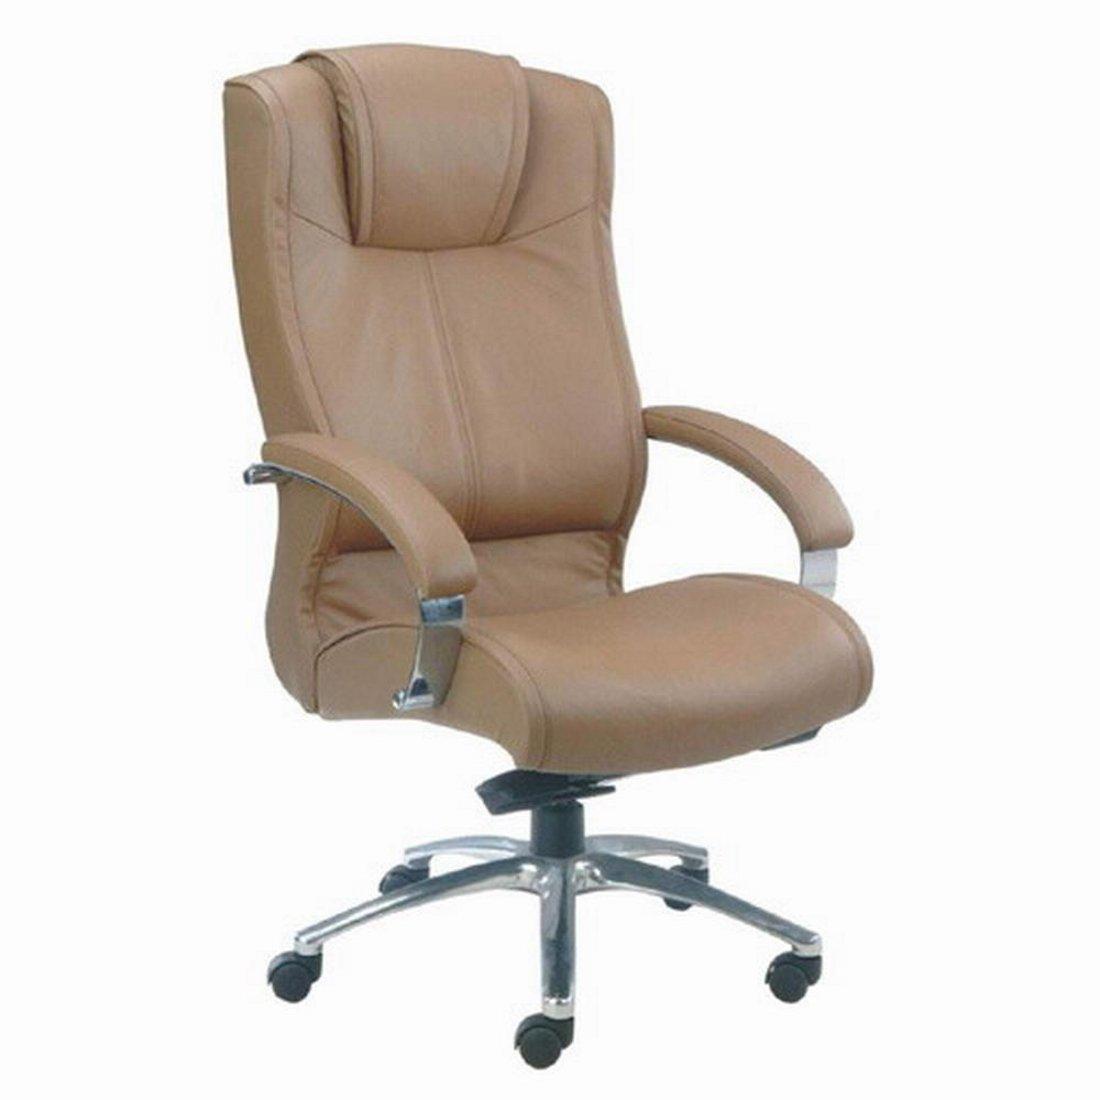 comfortable desk chair. Snug Desk Chair. Comfortable Chair E